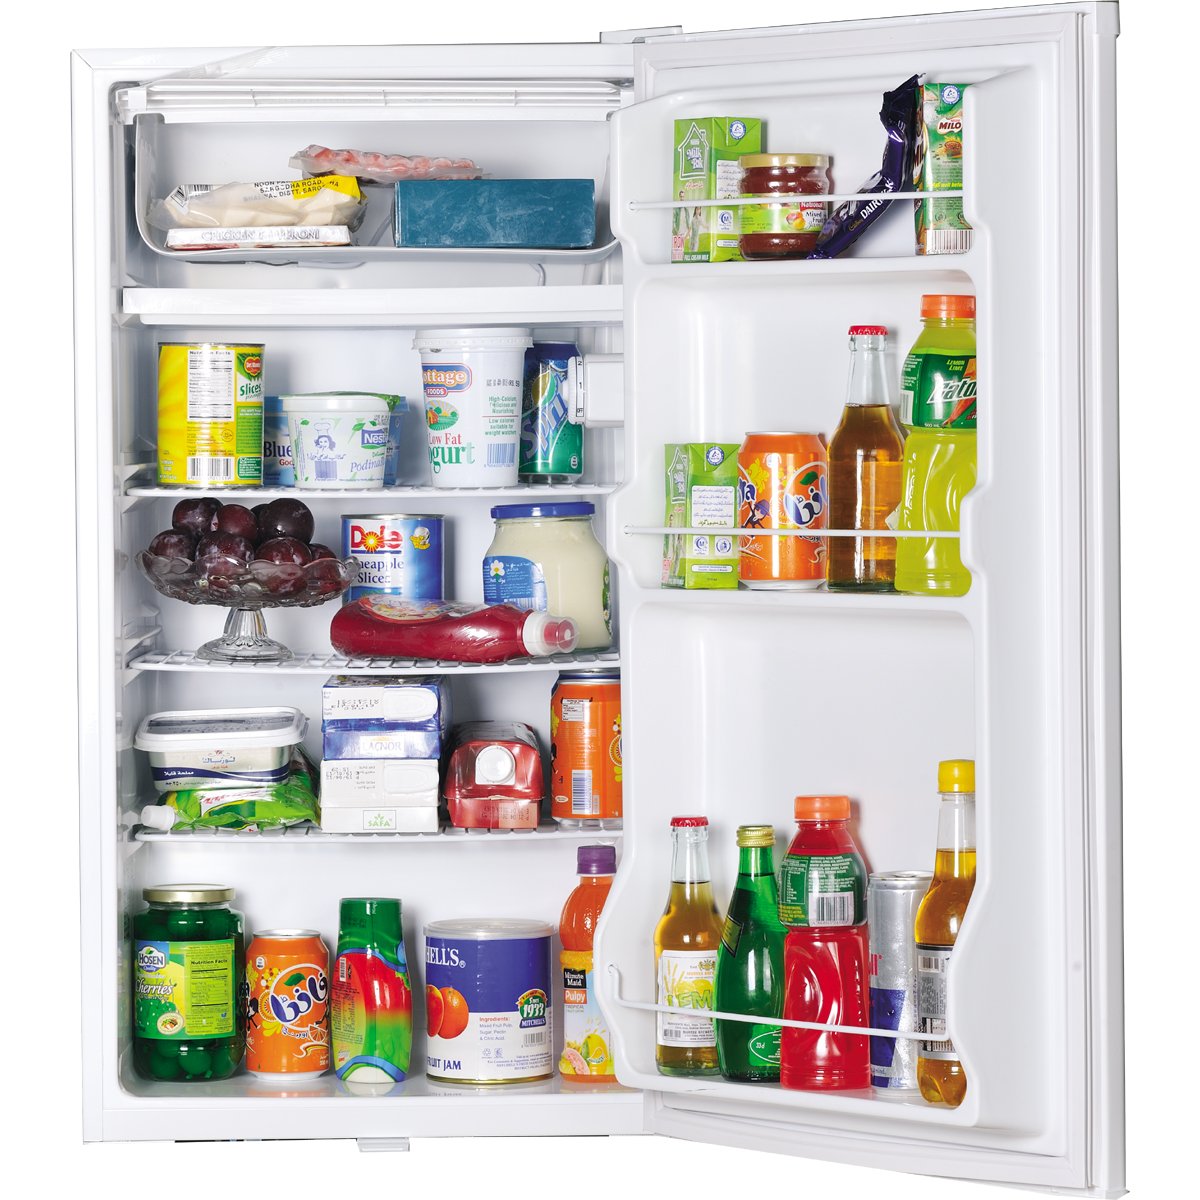 Haier Hr 136 Bss Mini Cool Refrigerator Price In Pakistan